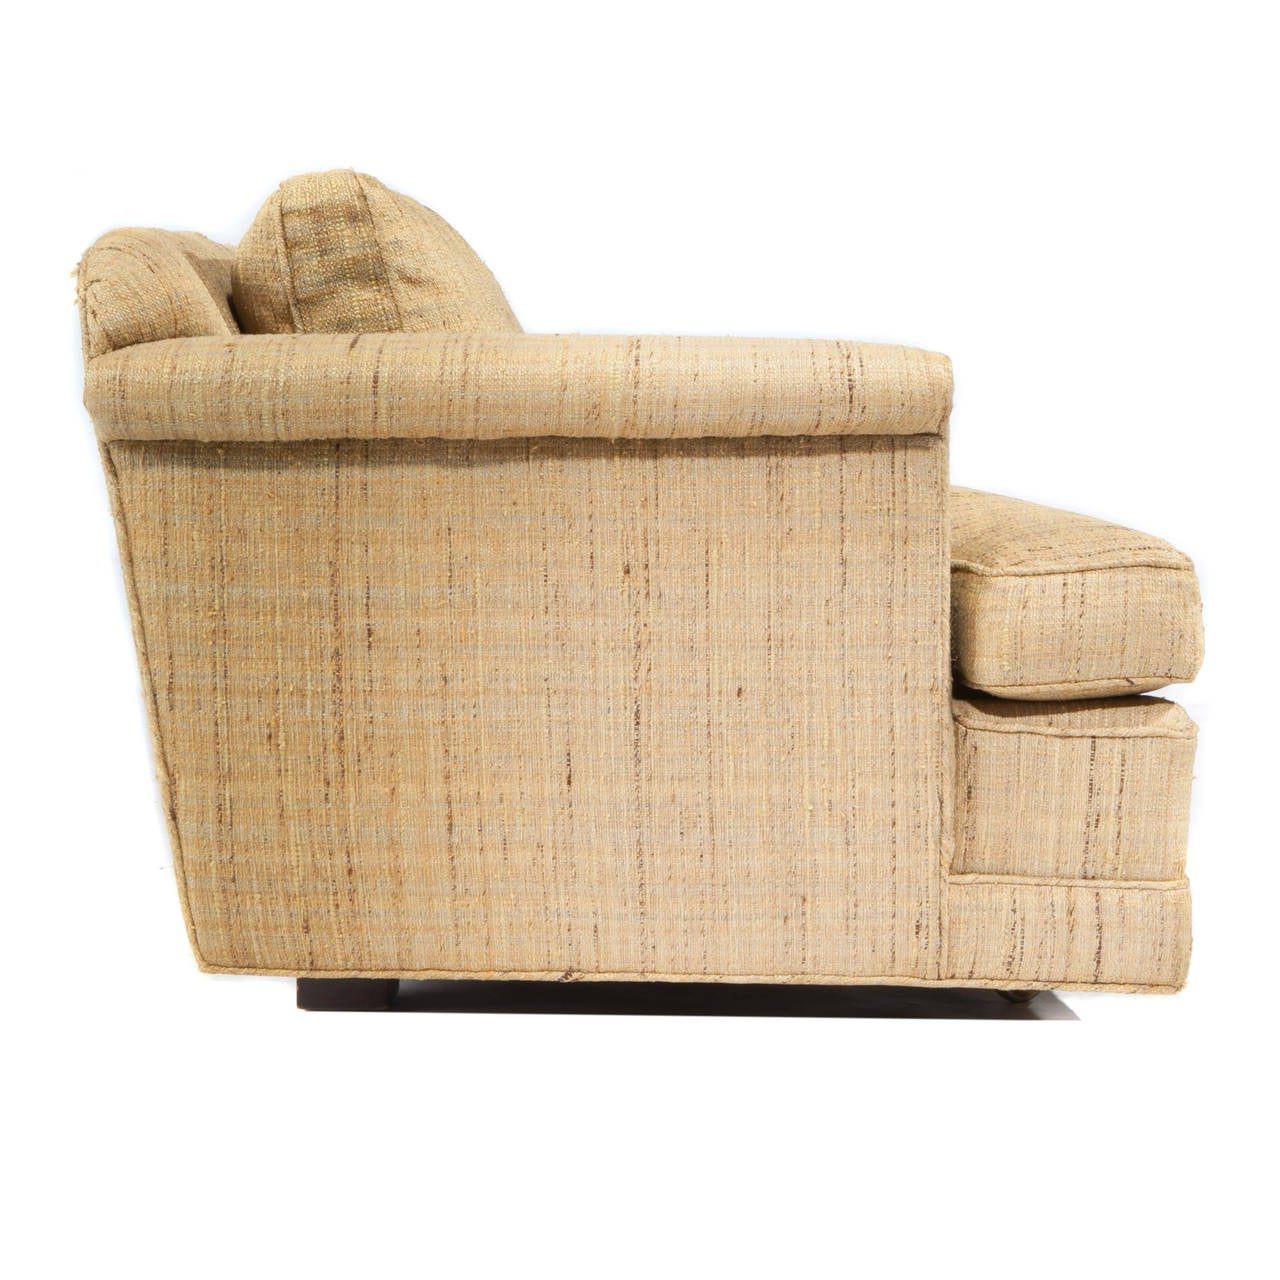 1950s Four-Seat Sofa by Edward Wormley for Dunbar 4